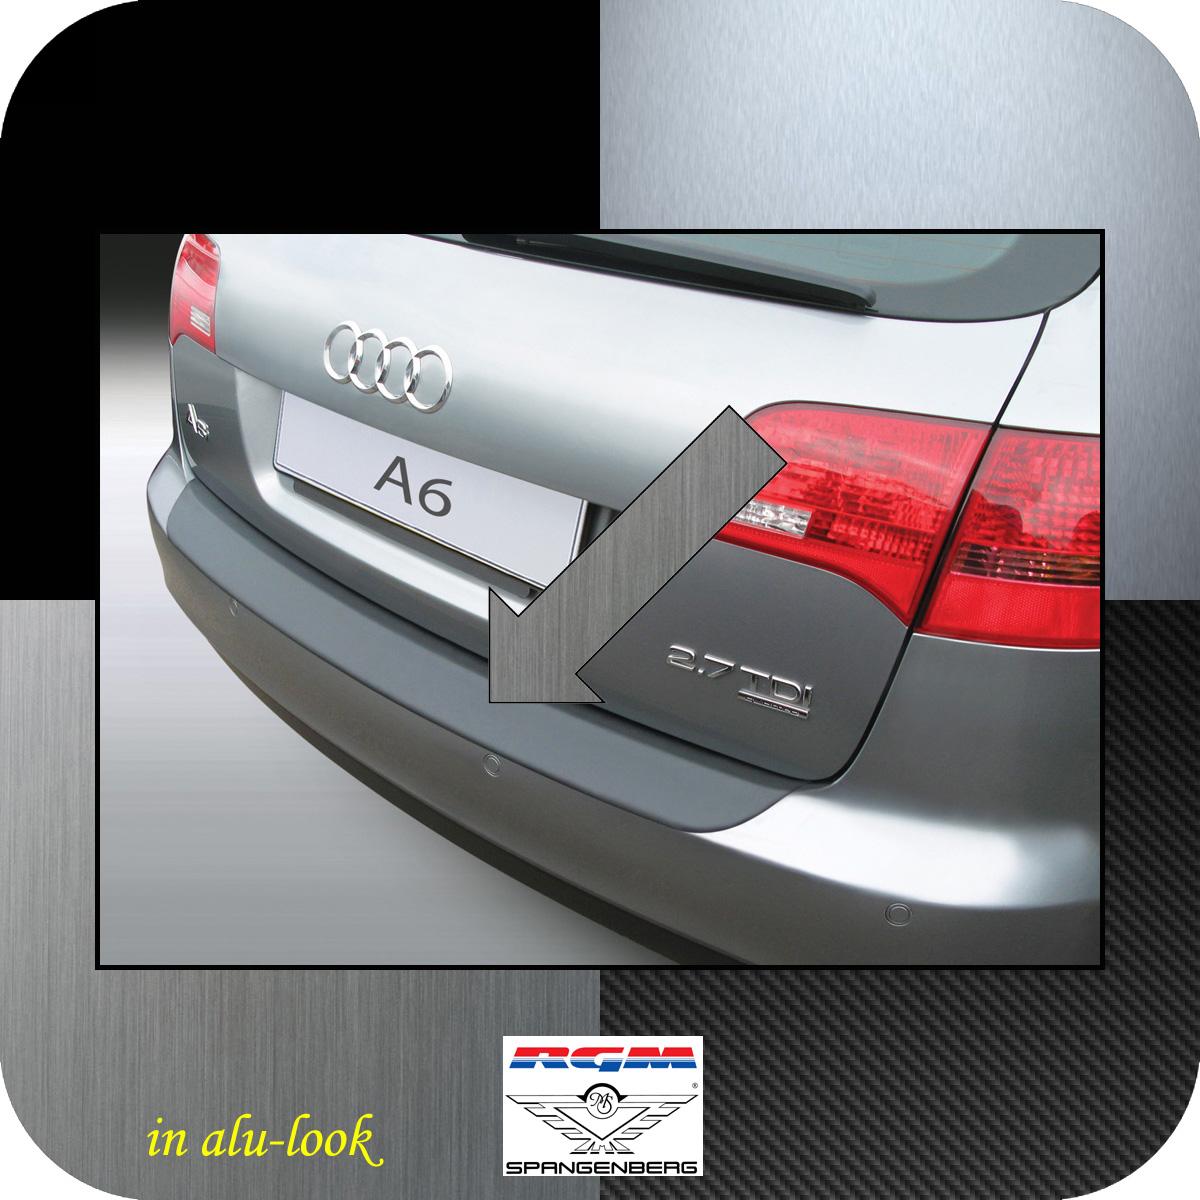 Ladekantenschutz Alu-Look Audi A6 C6 Avant auch Allroad Kombi 2005-11 3504341